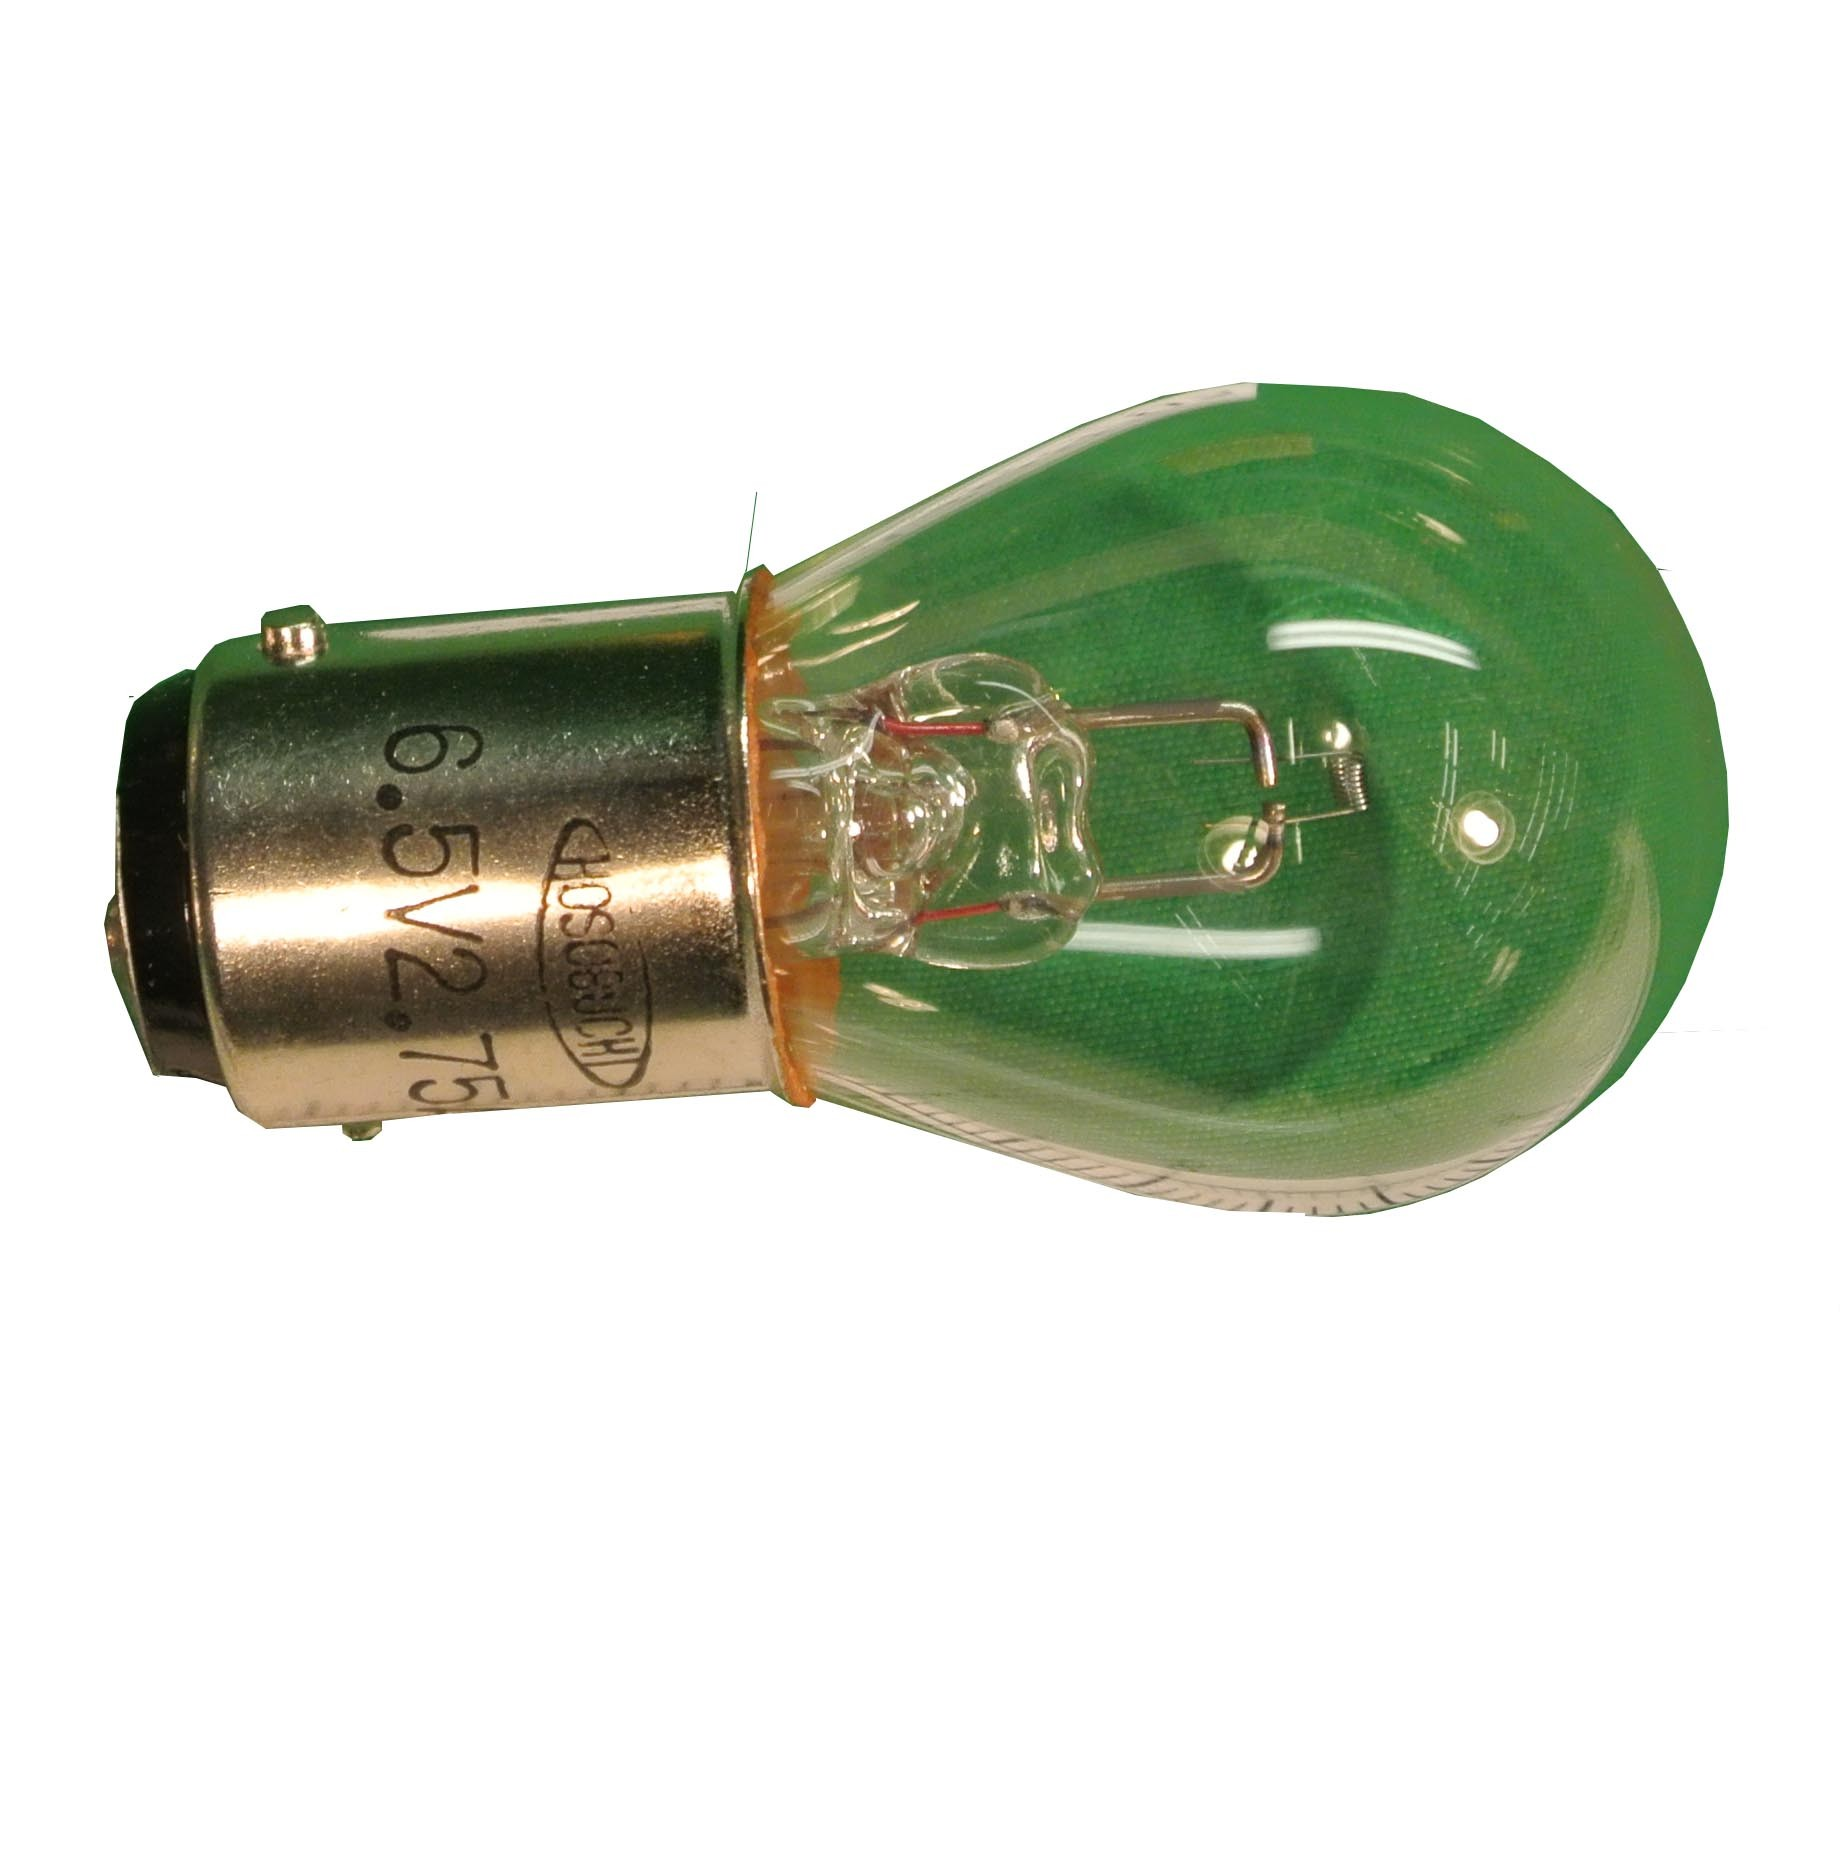 MA269/05 Bulb 6.5V, 2.75W [DISCONTINUED]